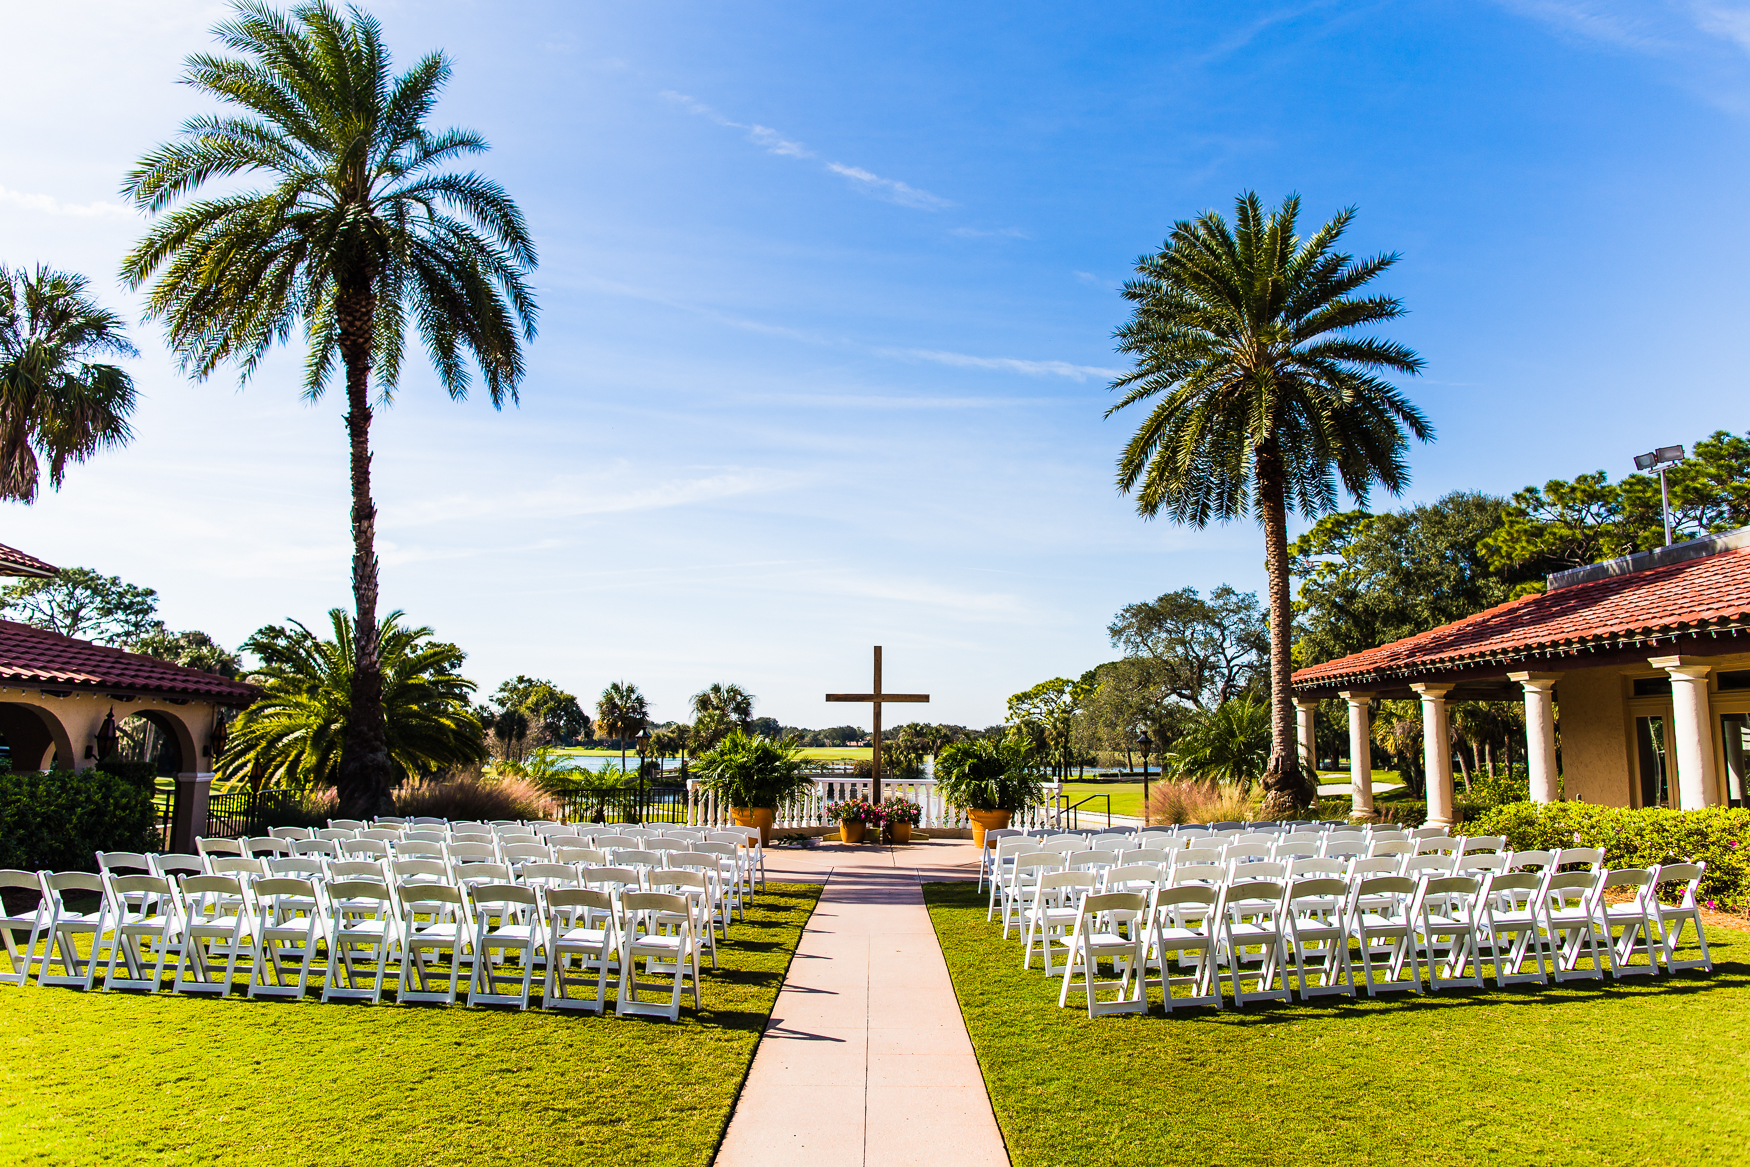 Wheatfield inn wedding